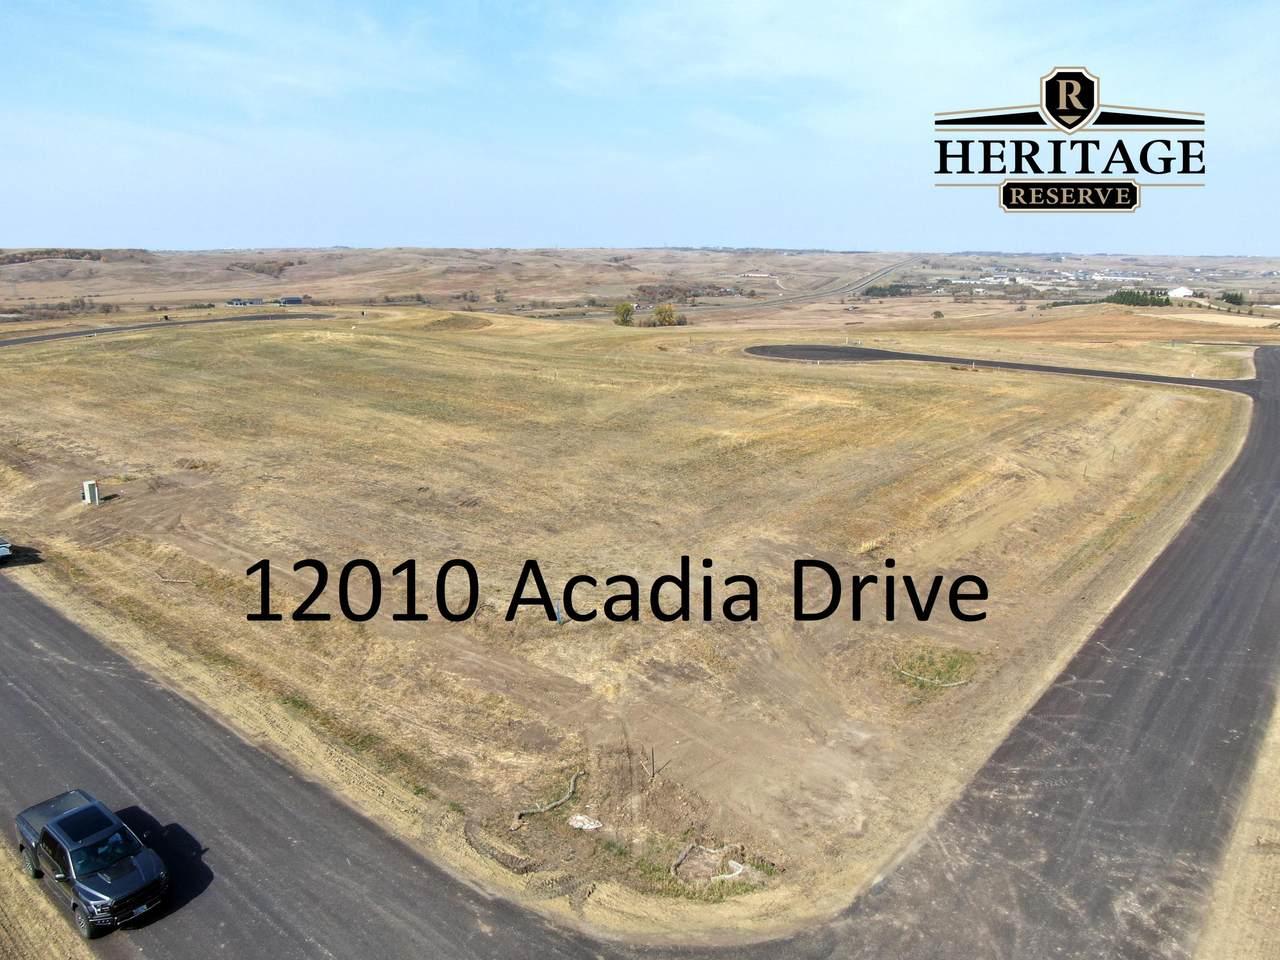 12010 Acadia Drive - Photo 1